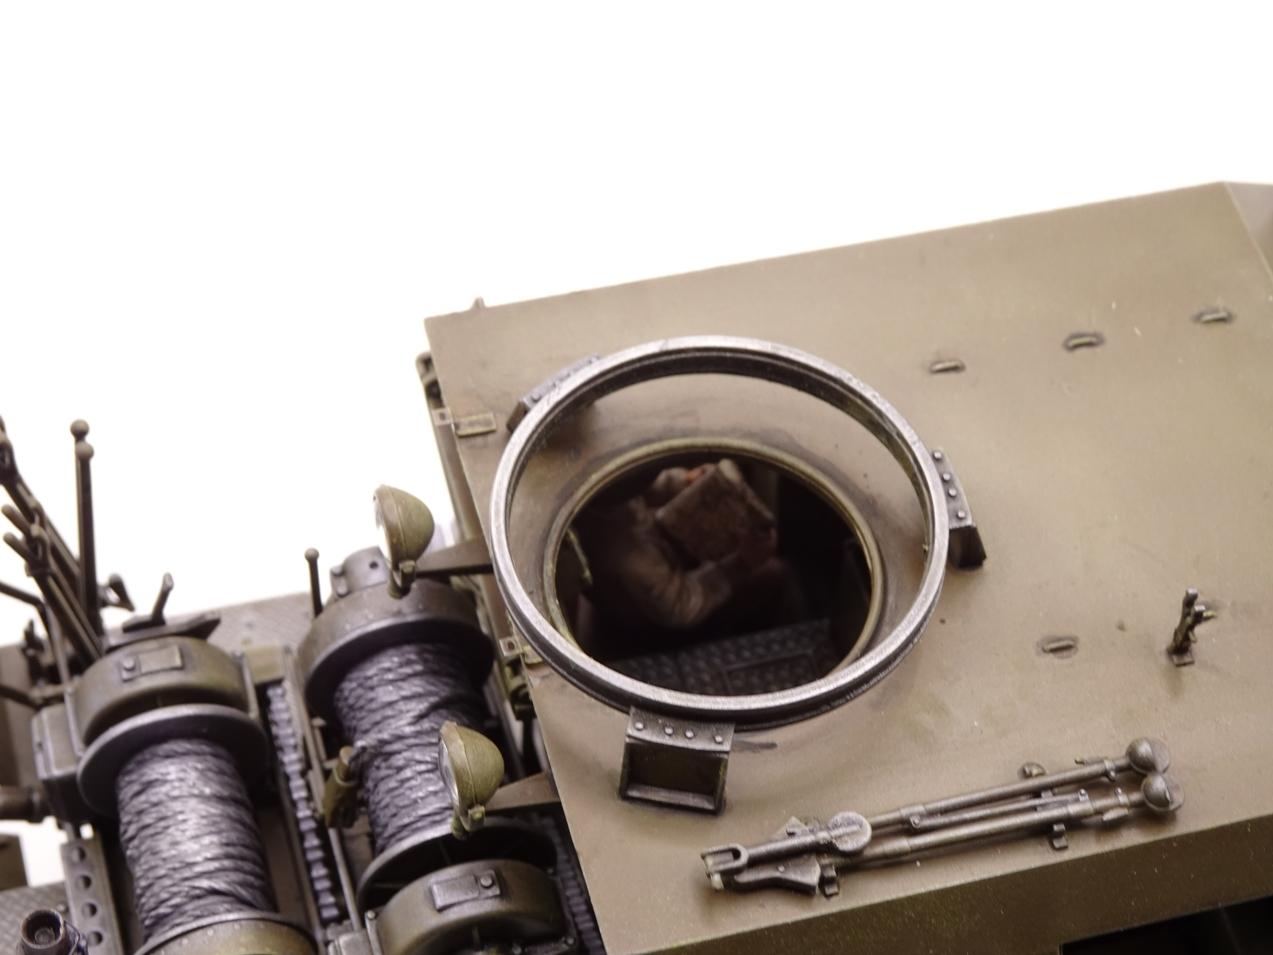 [Tamiya 1/35] M26 Armored tank recovery vehicle réf. 35244 - Page 3 M26-1810-4b